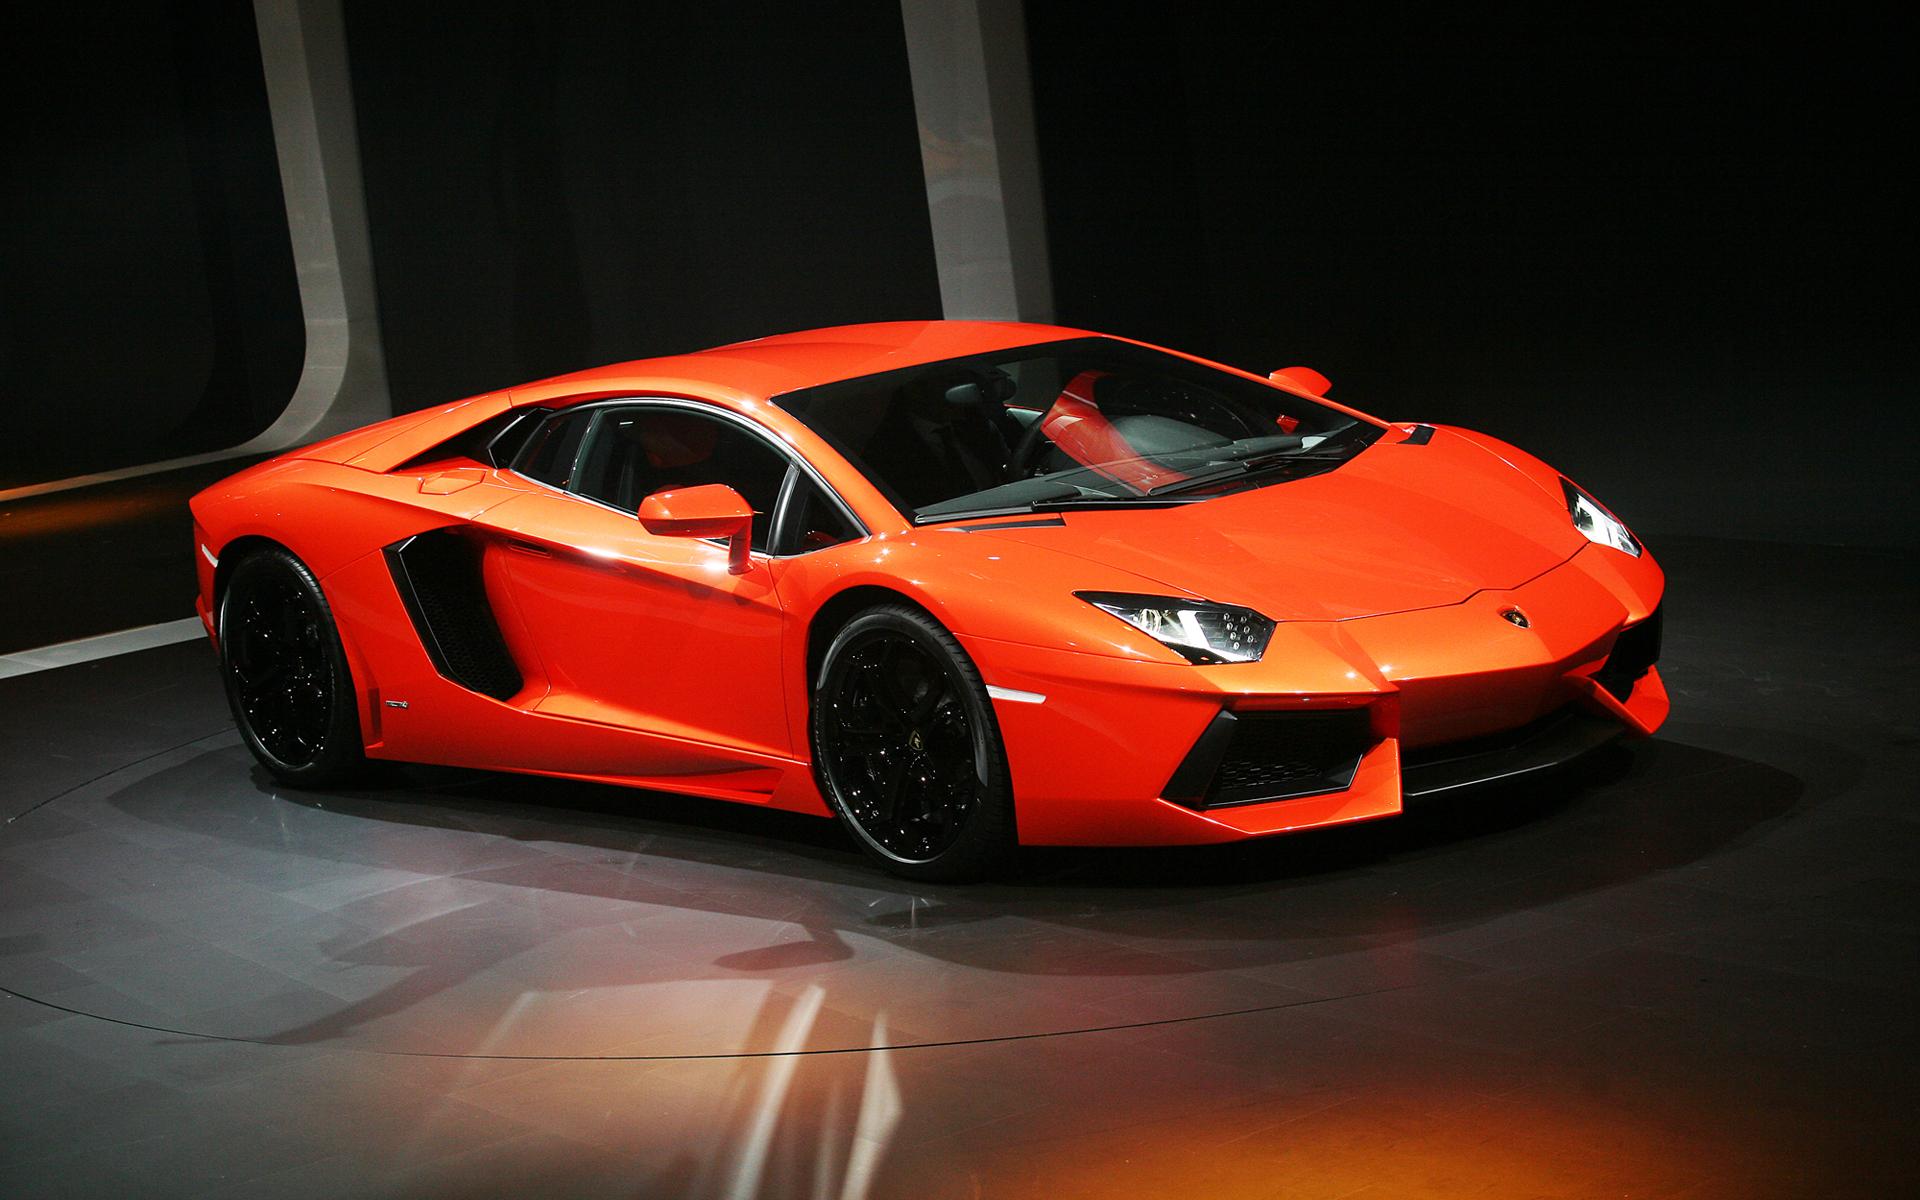 lamborghini aventador wide The Lamborghini Aventador